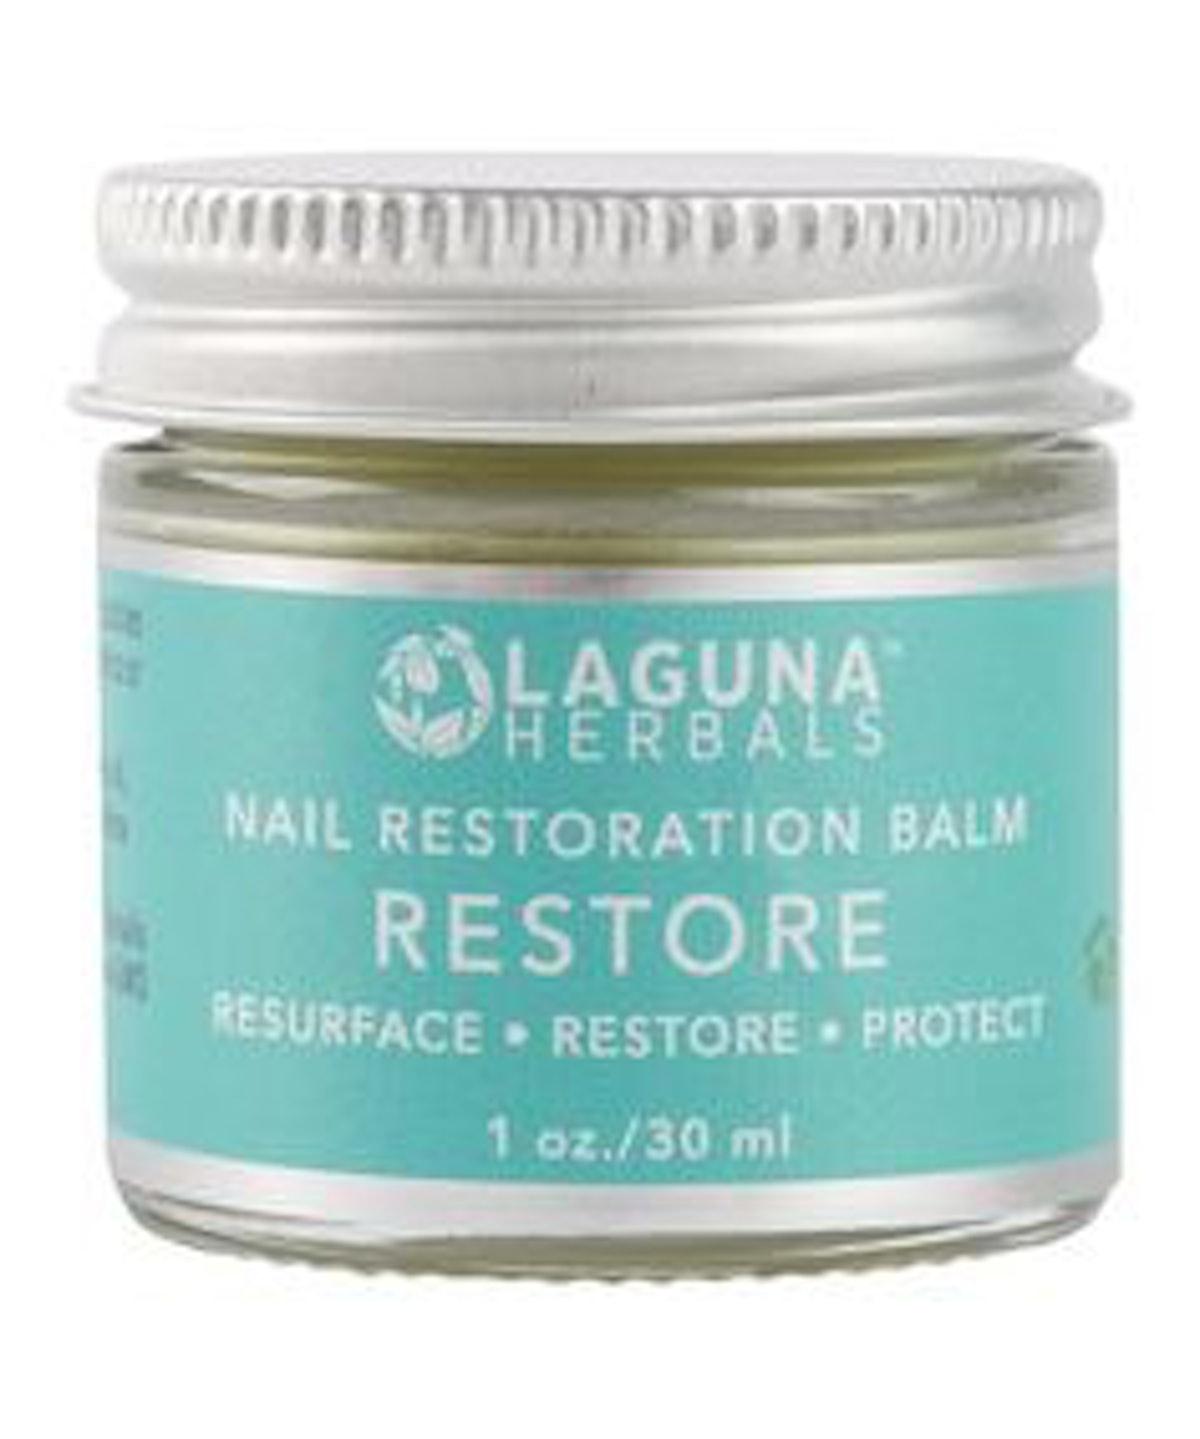 Restore - Nail Restoration Balm